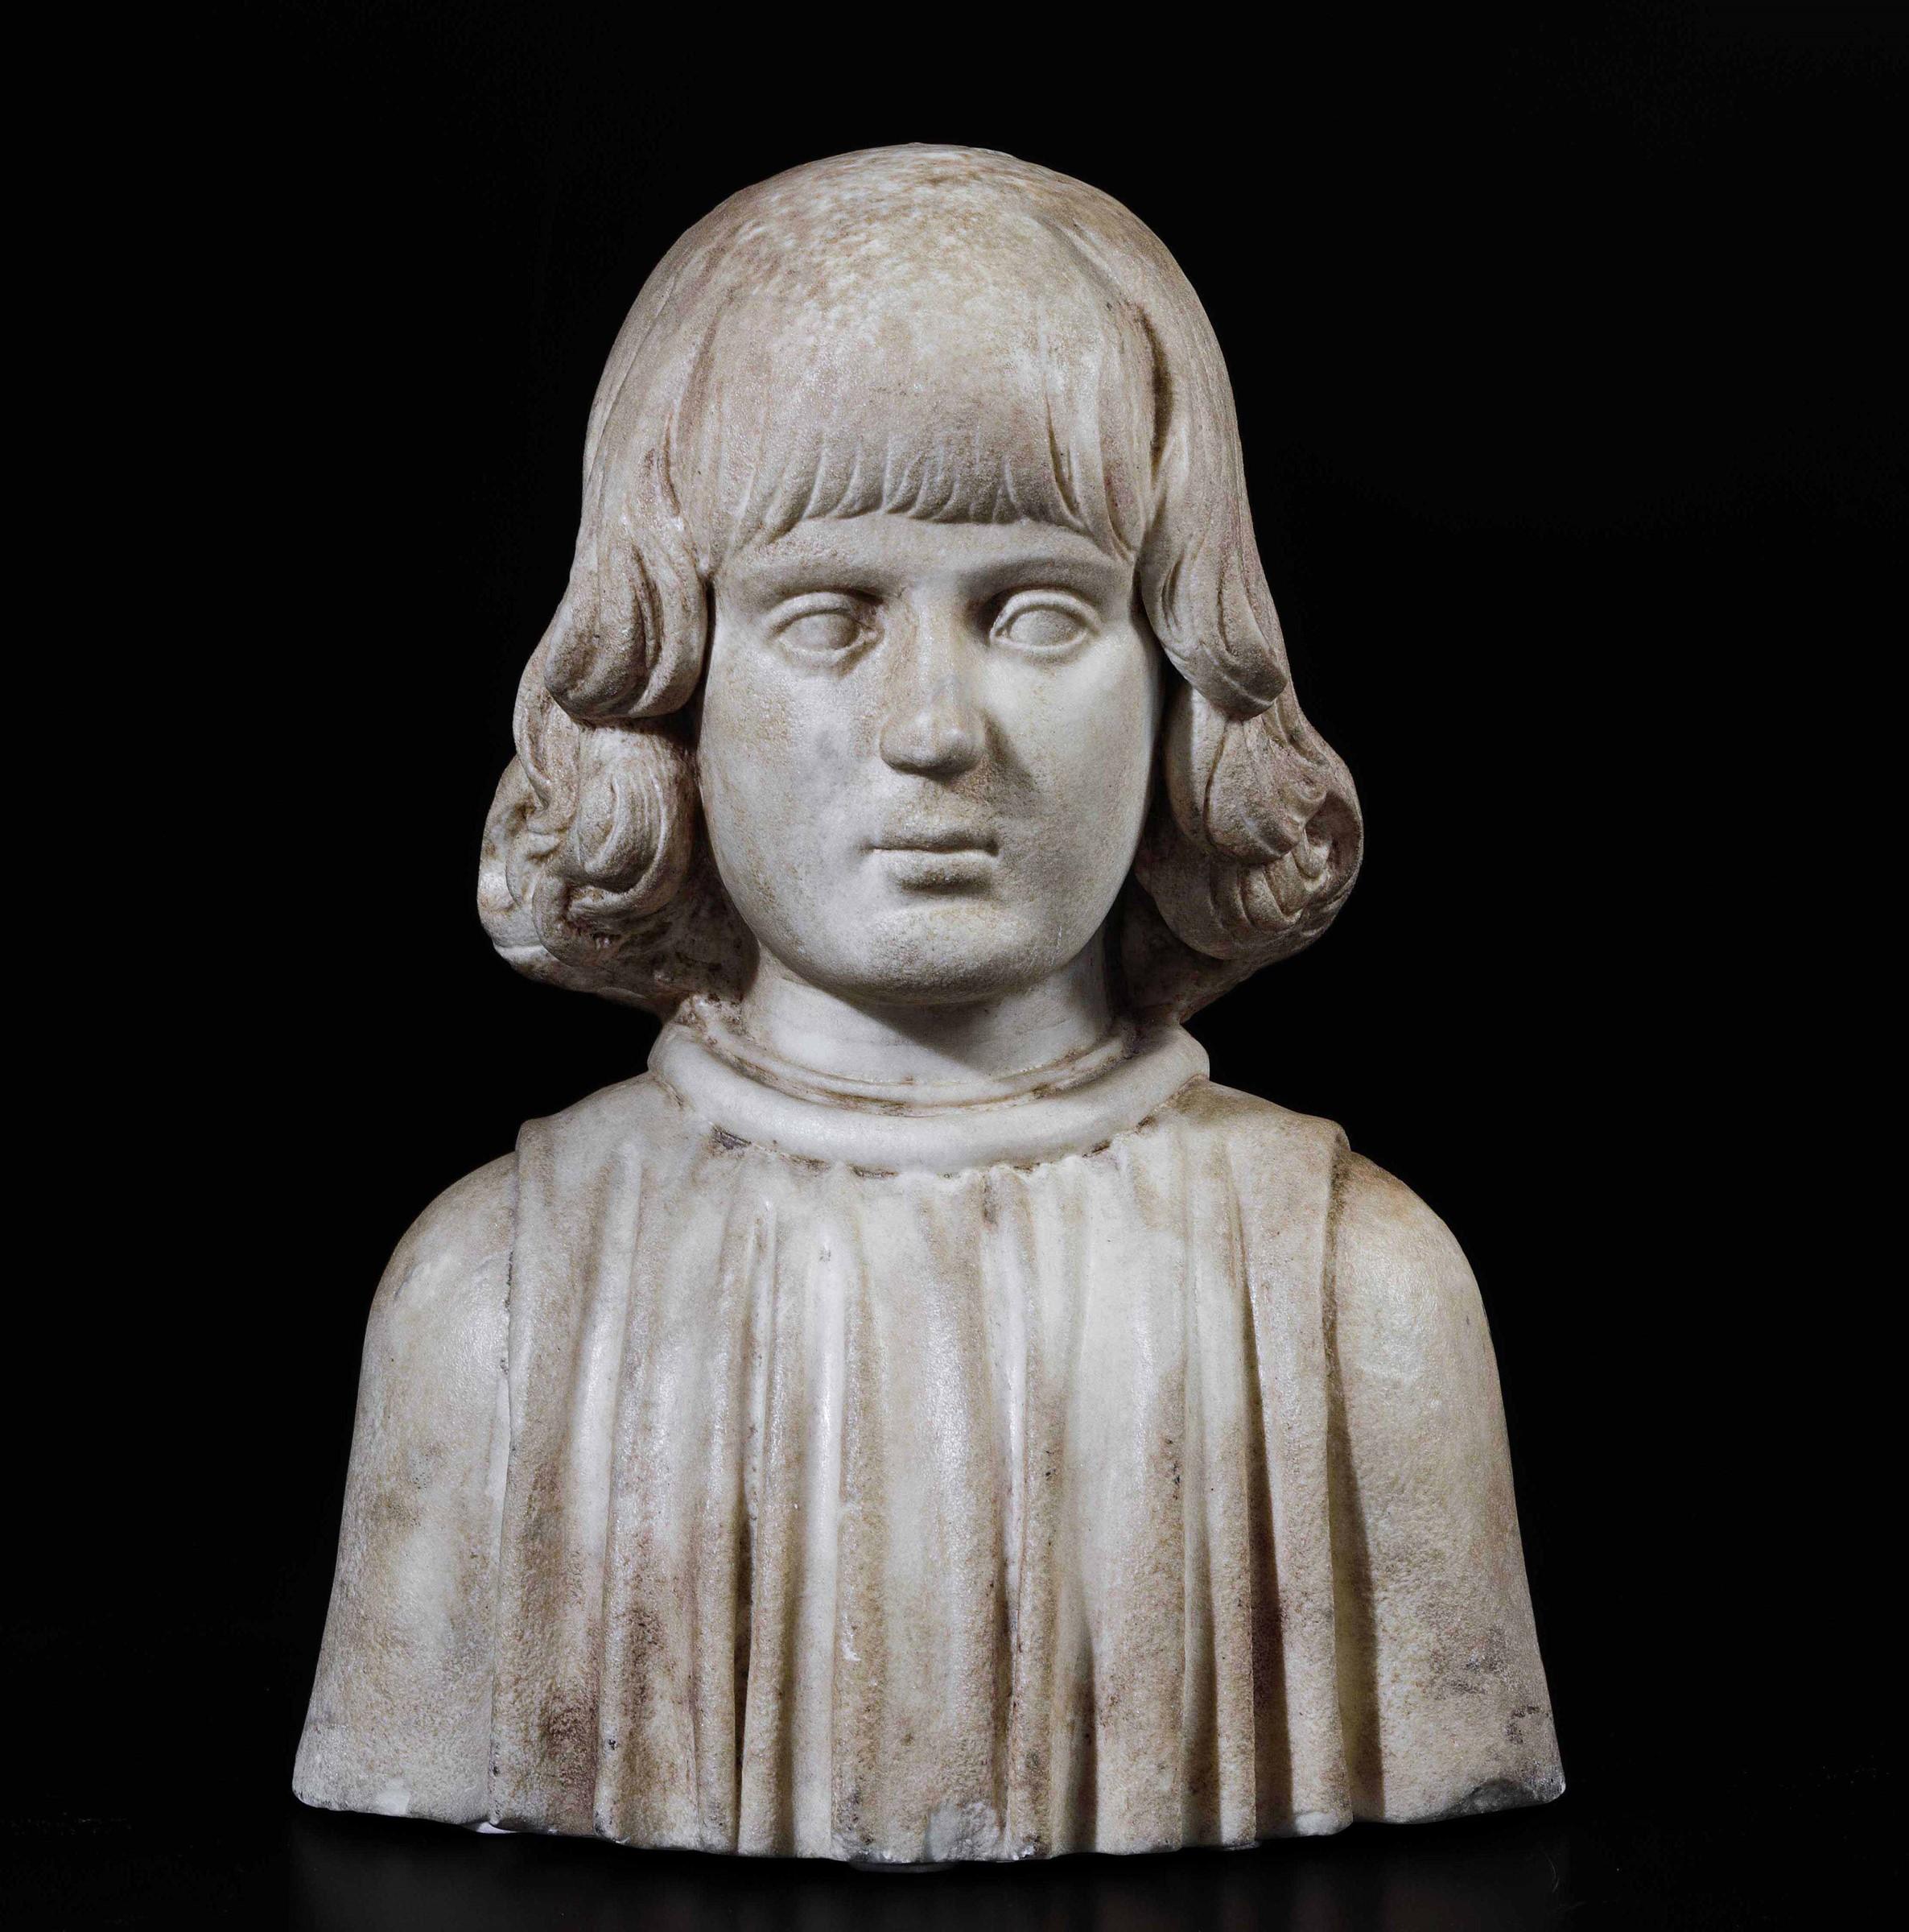 A marble bust, attr. F. Laurana, 1400s - cm 41x32x22. L'opera è accompagnata da una [...]